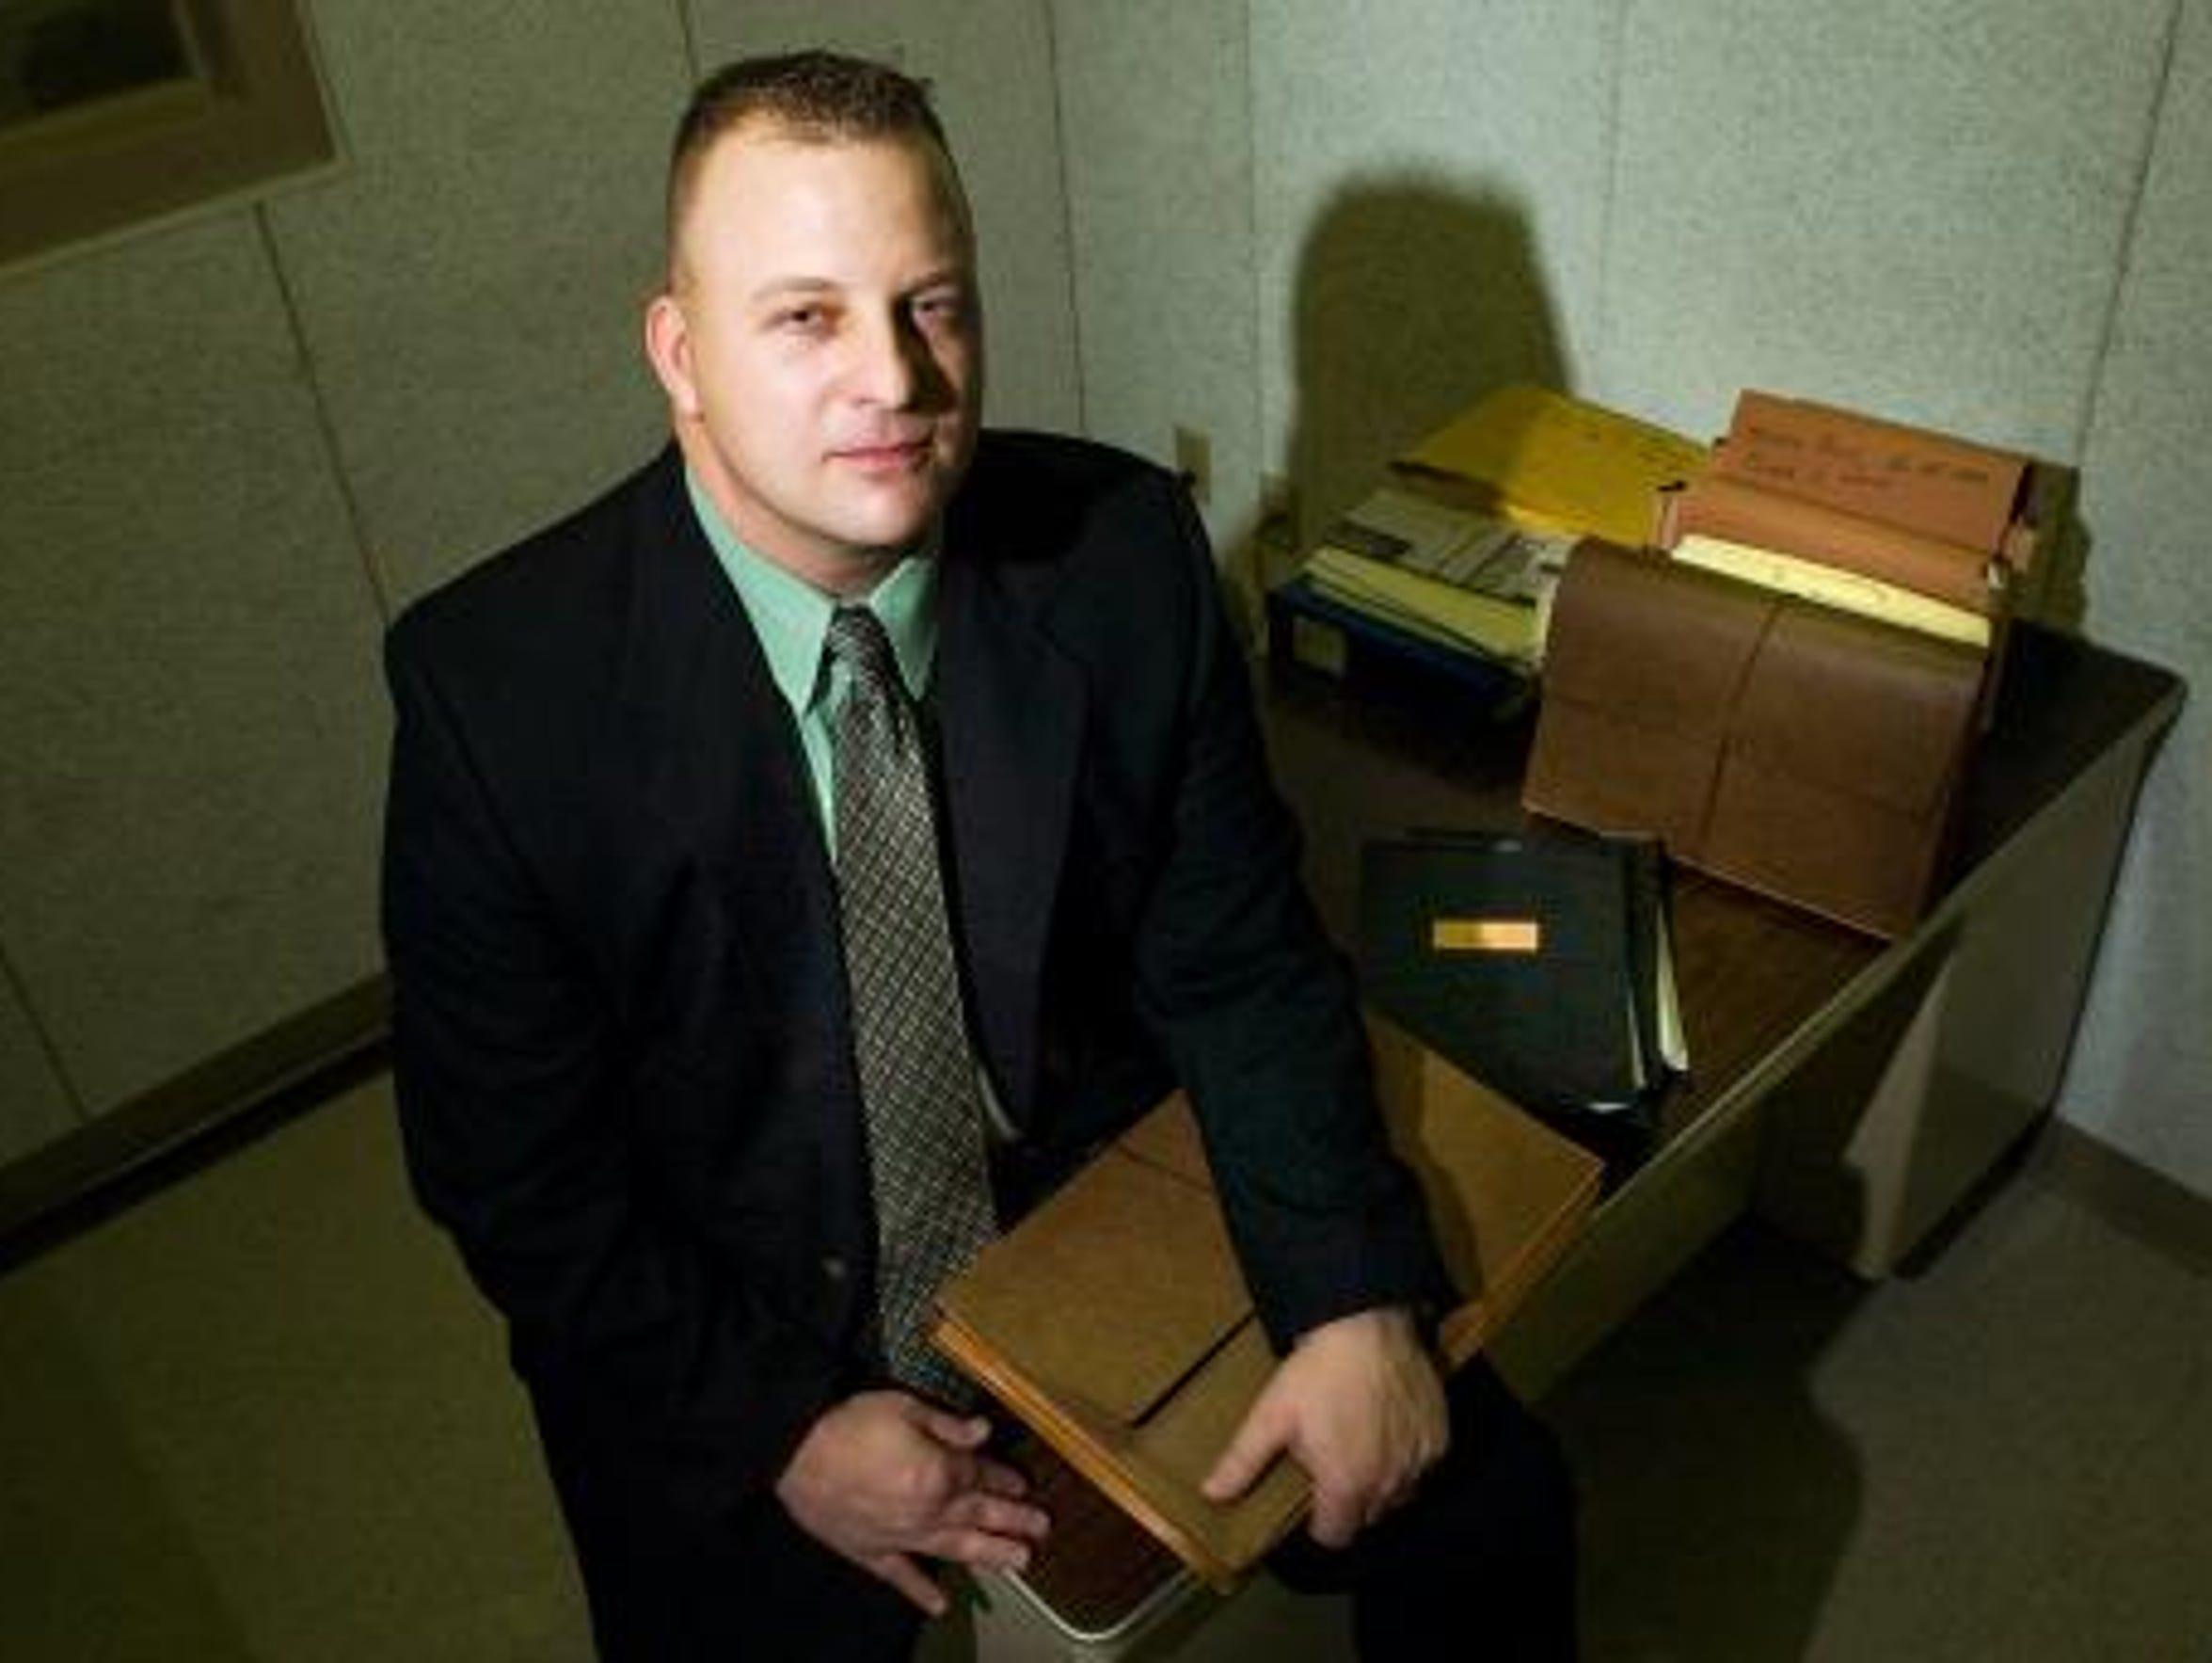 Pennsylvania State Trooper Scott Denisch